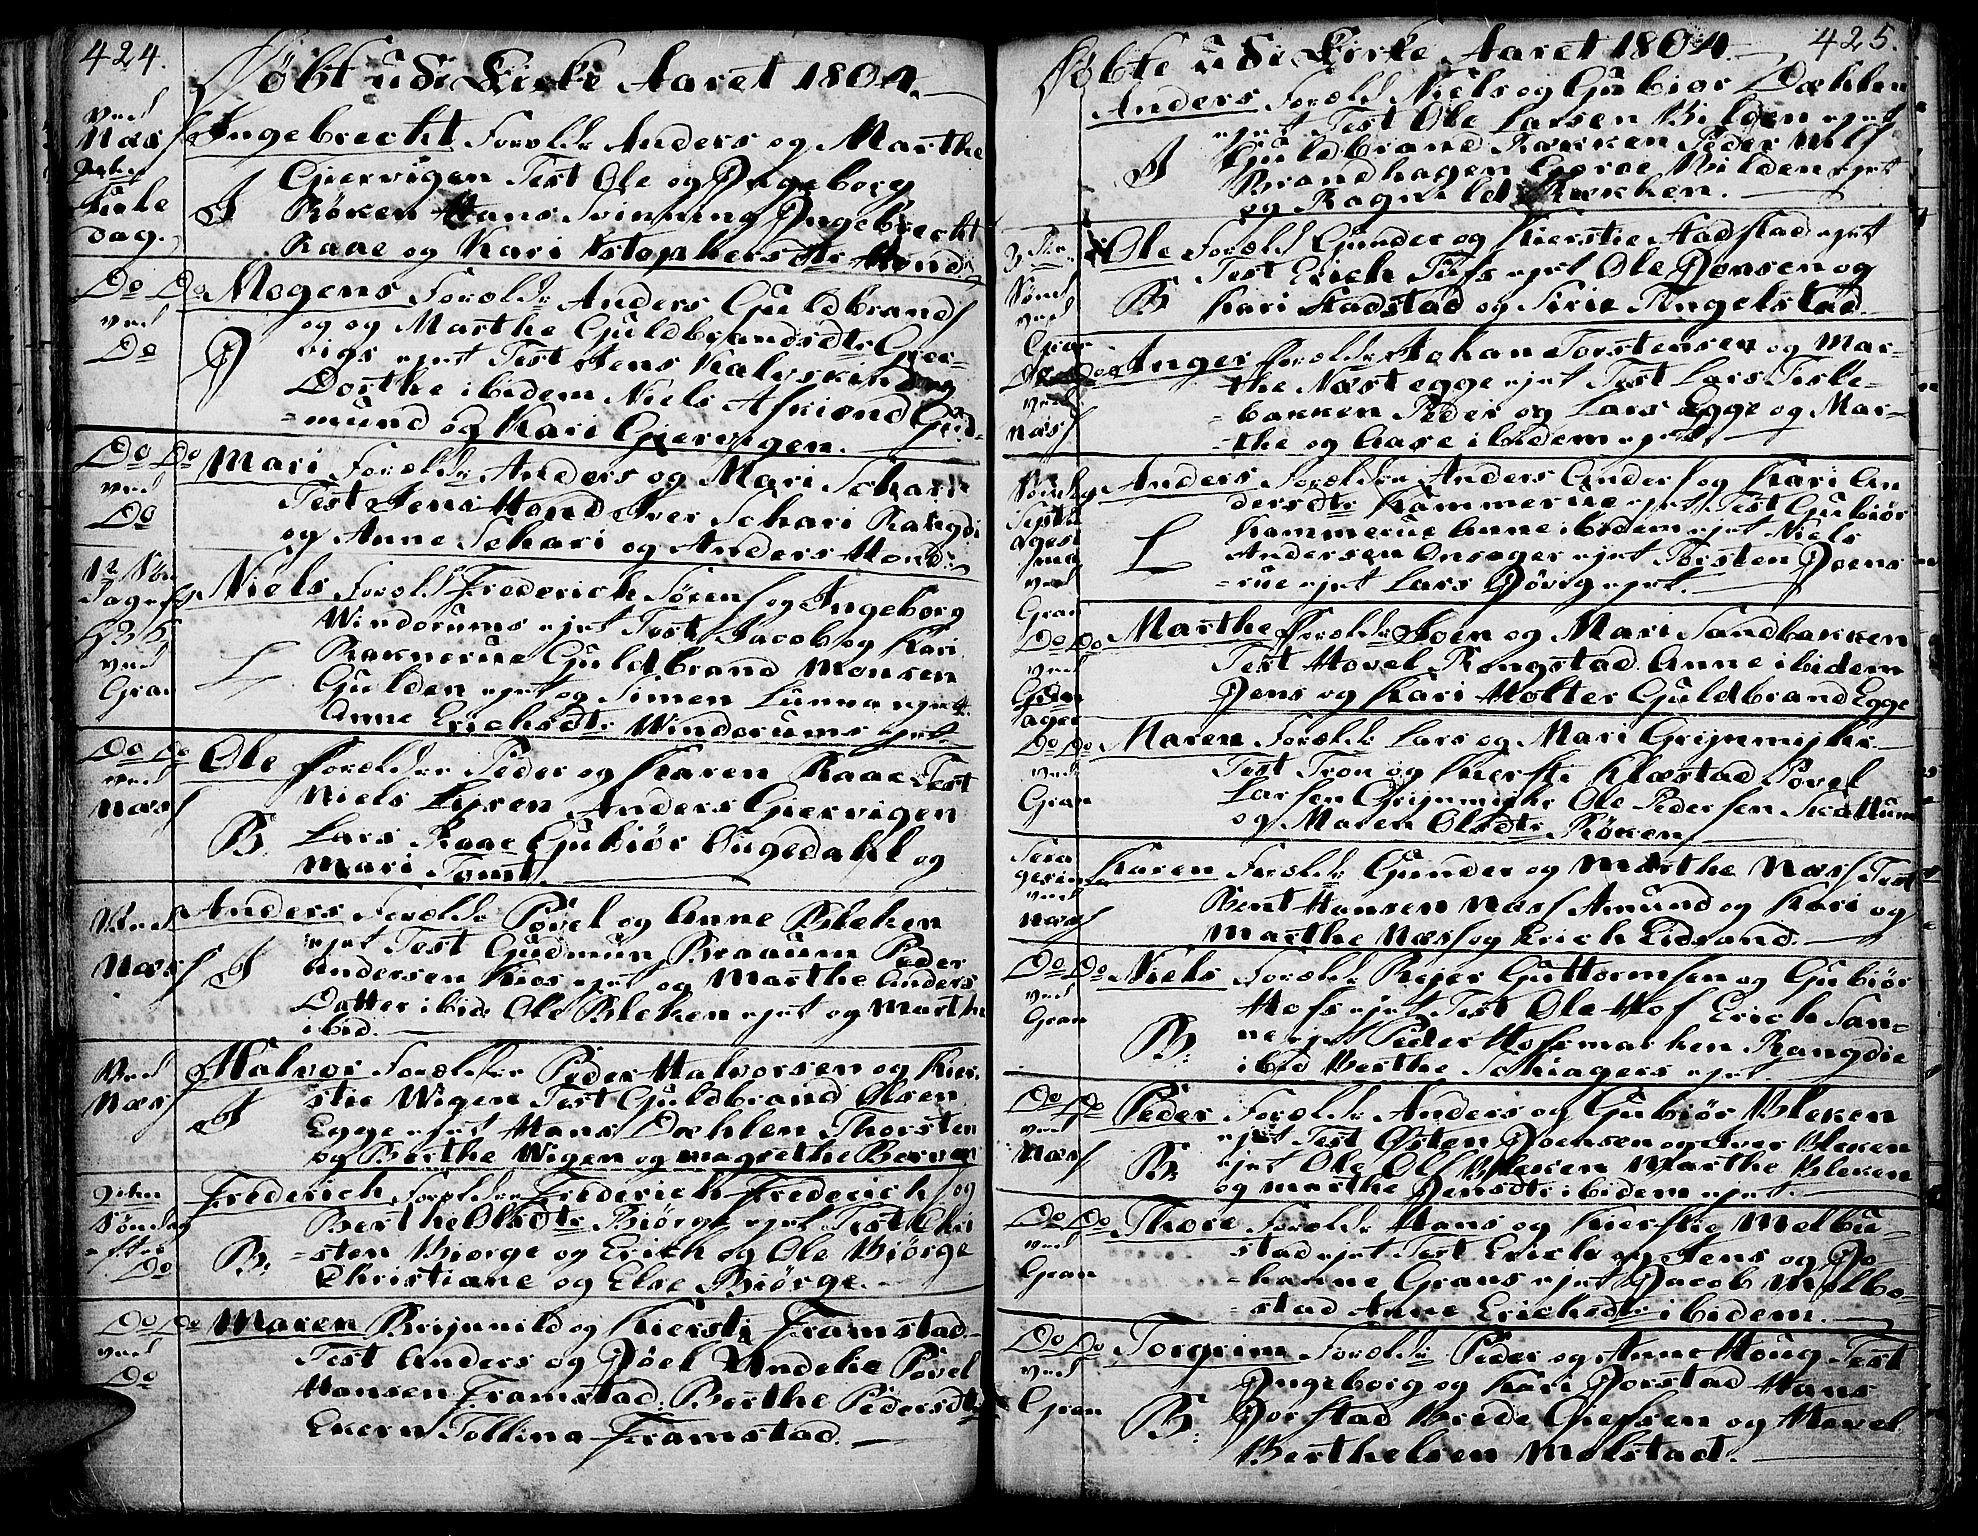 SAH, Gran prestekontor, Ministerialbok nr. 6, 1787-1824, s. 424-425